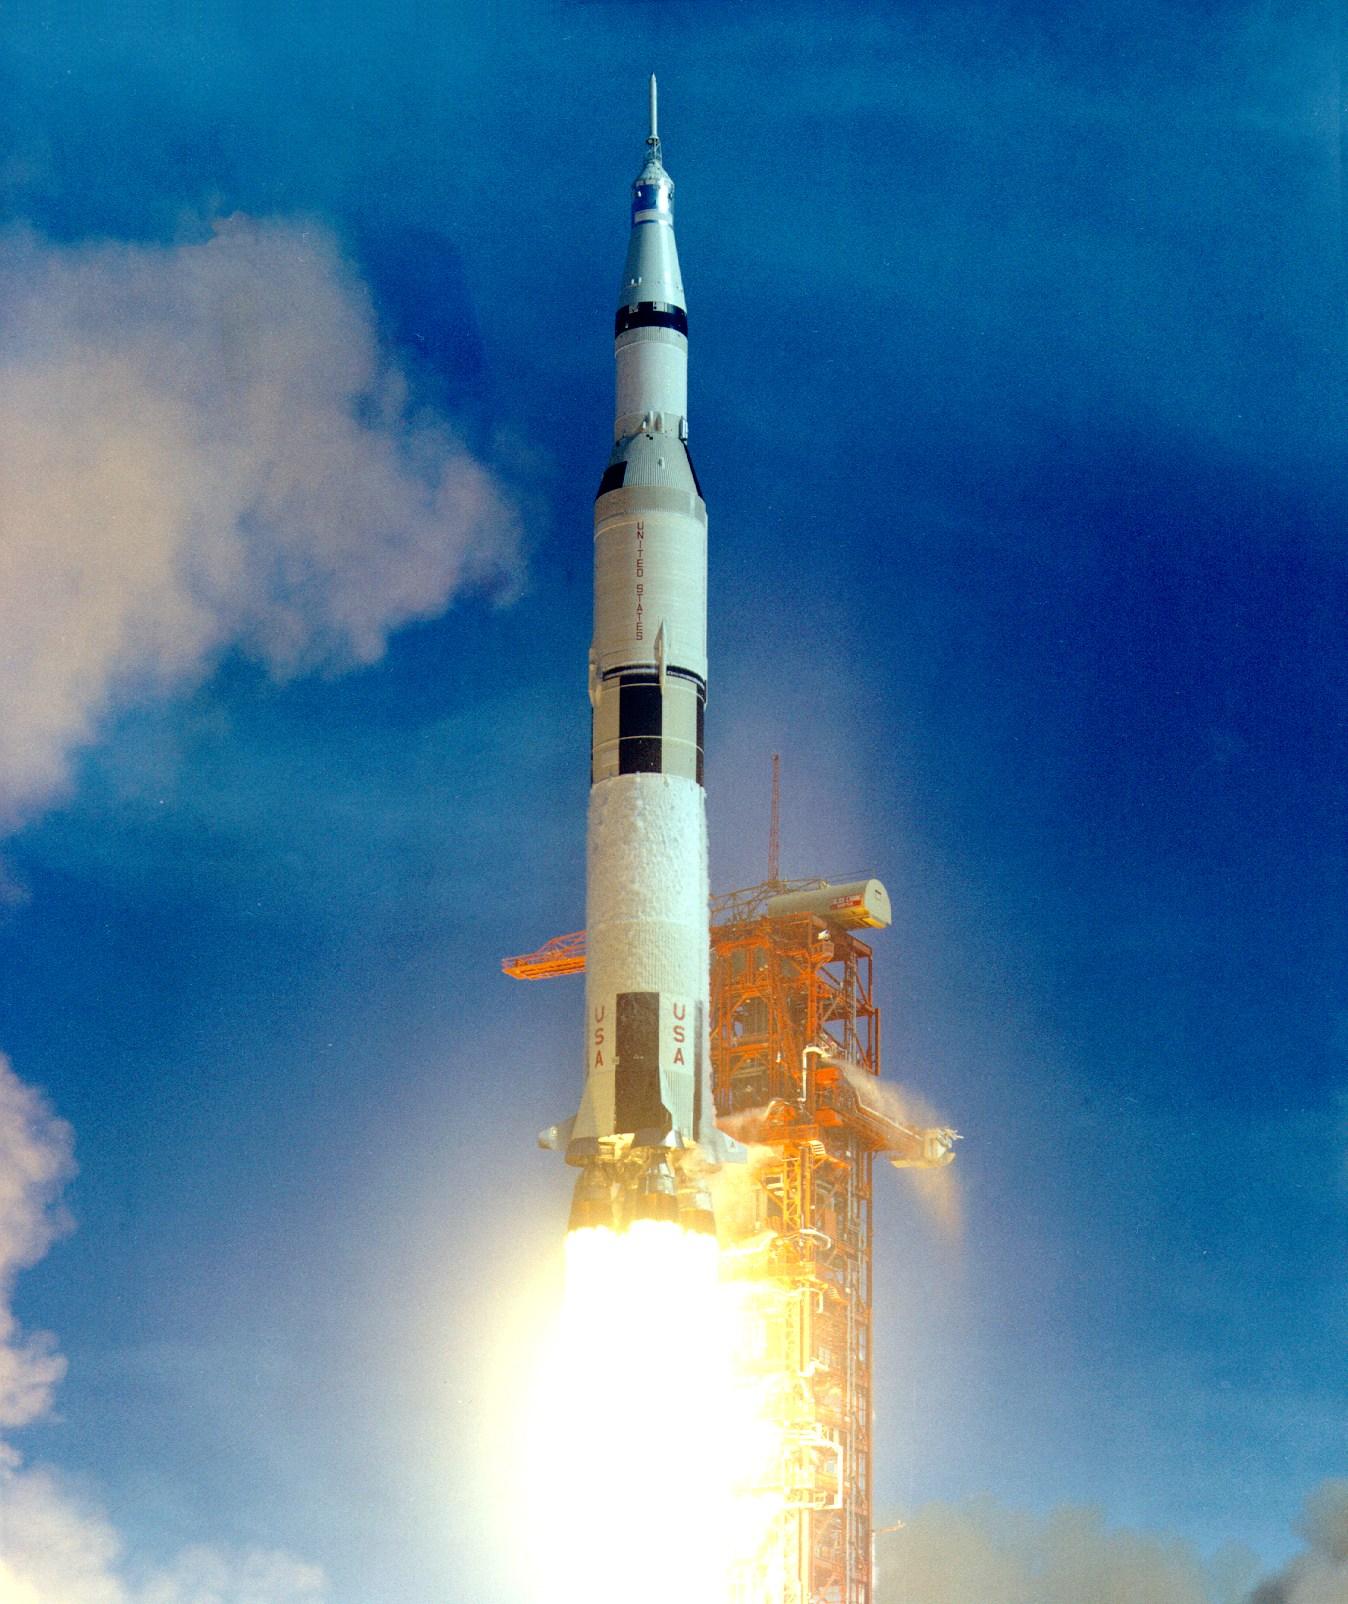 The Apollo Moon Rocket